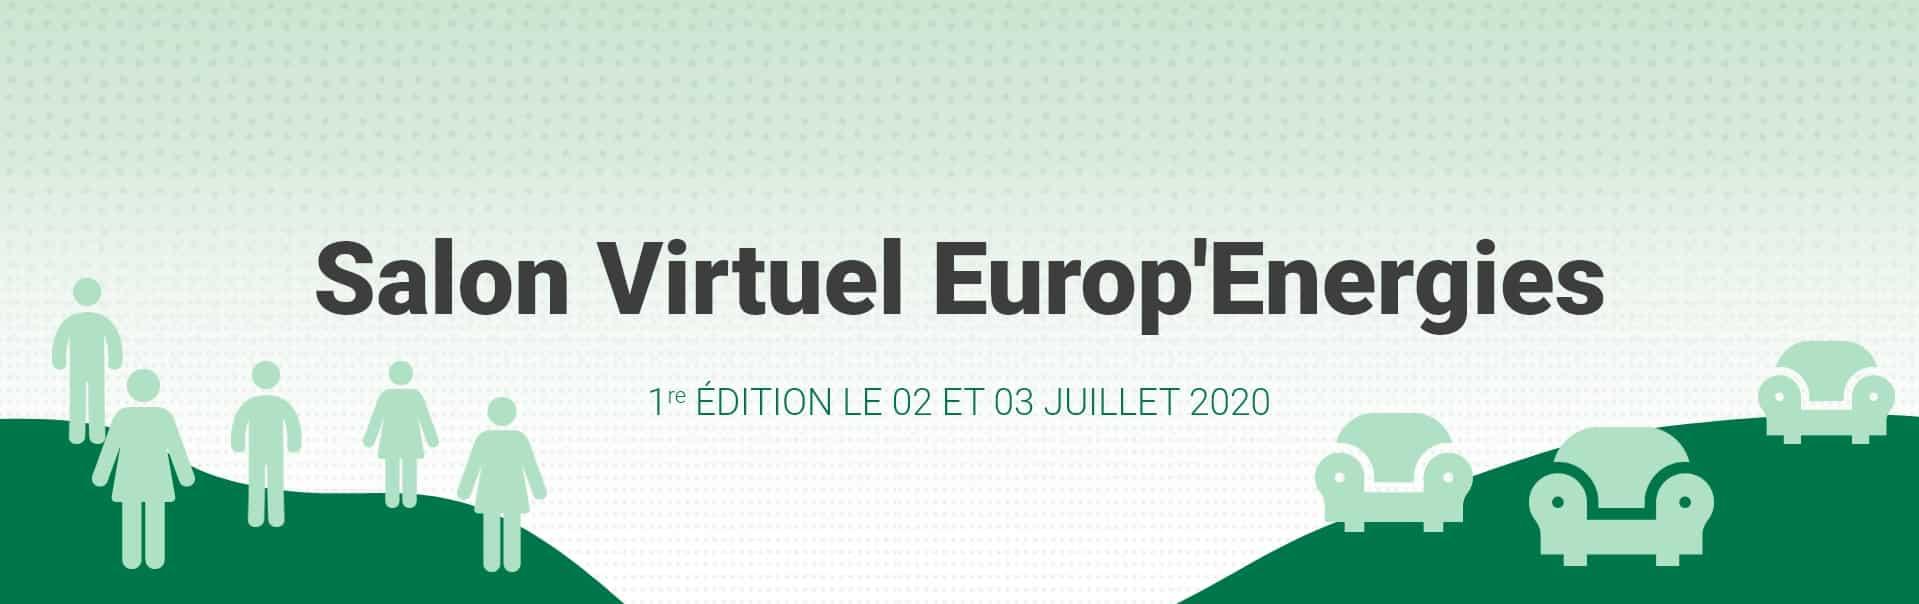 salon virtuel europ'energies